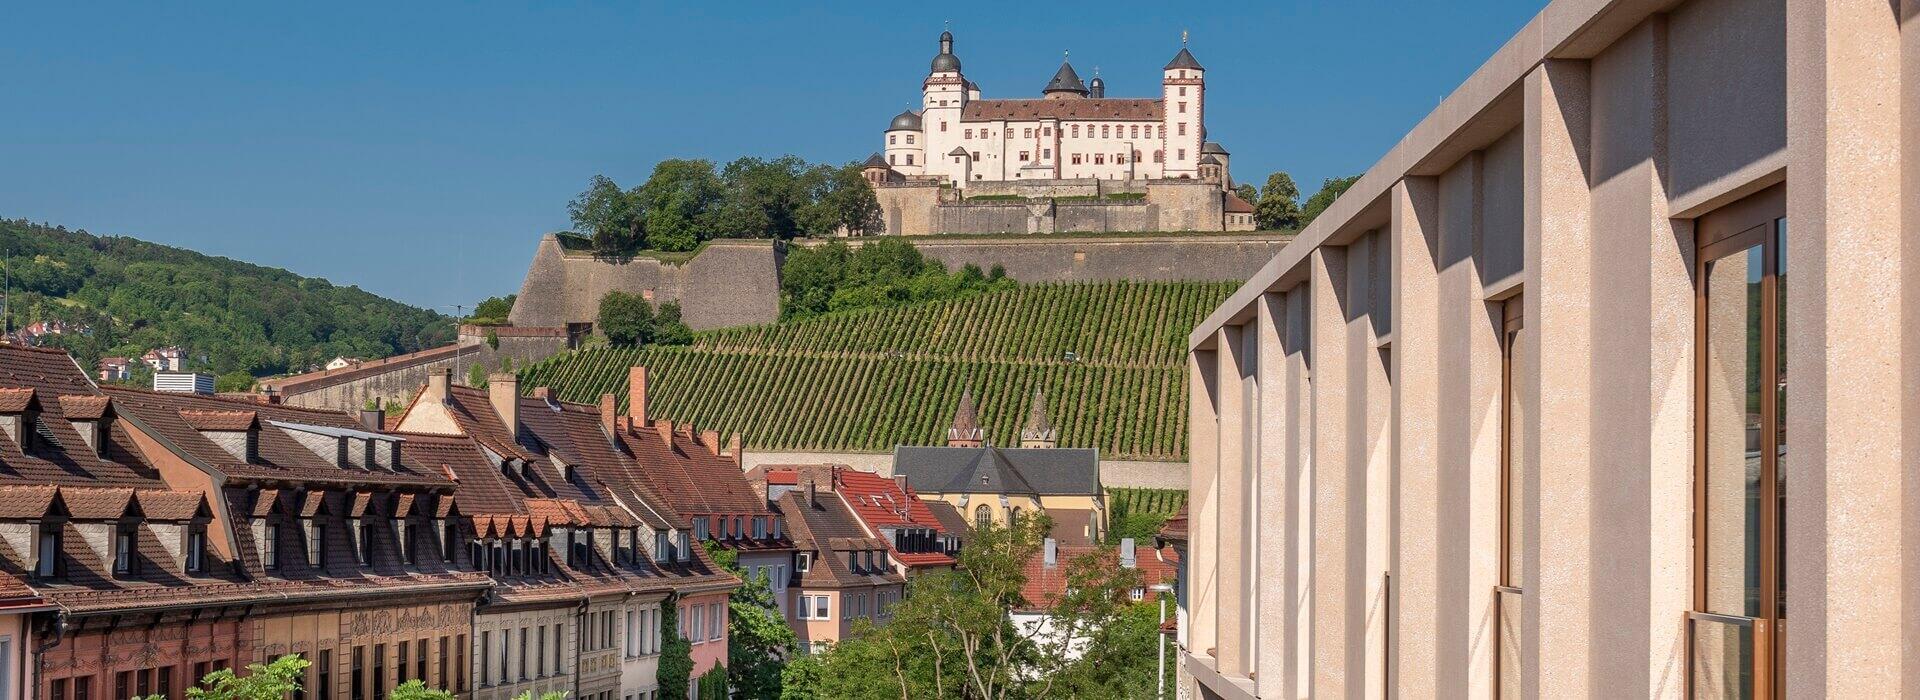 Festung_Marienberg_Wuerzburg